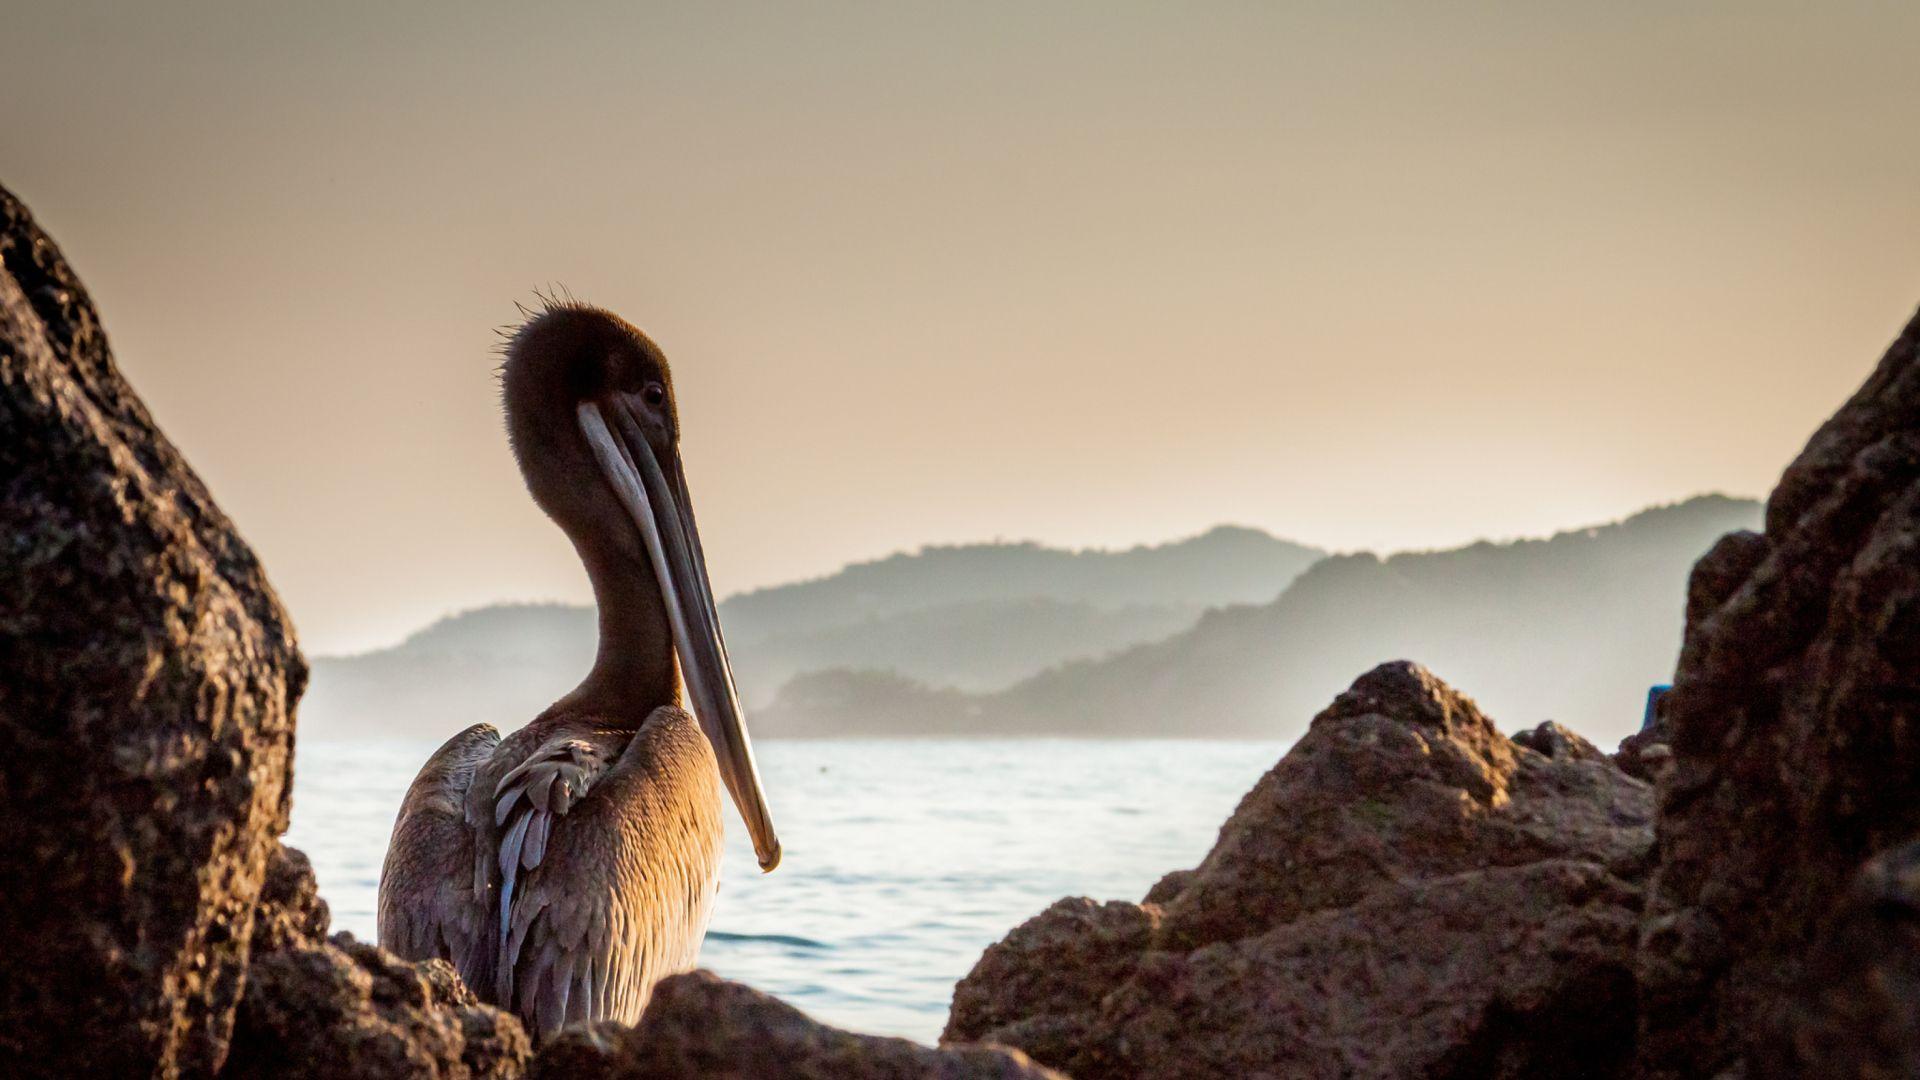 Pelican wallpaper photo full hd